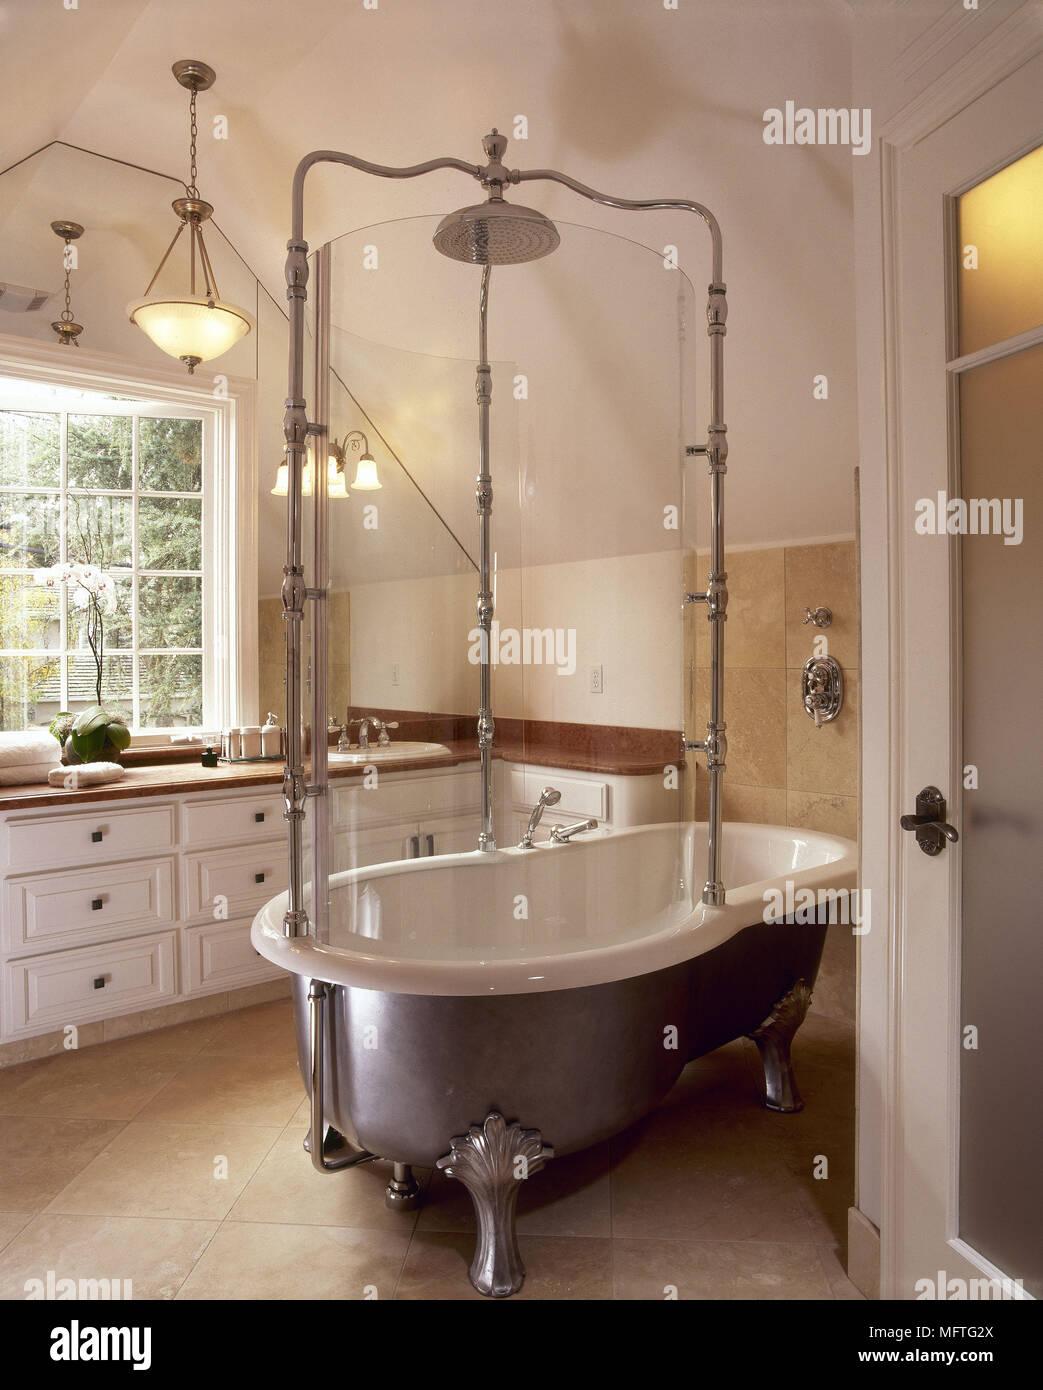 Bathroom With Edwardian Style Free Standing Roll Top Bath Usa Stock Photo Alamy